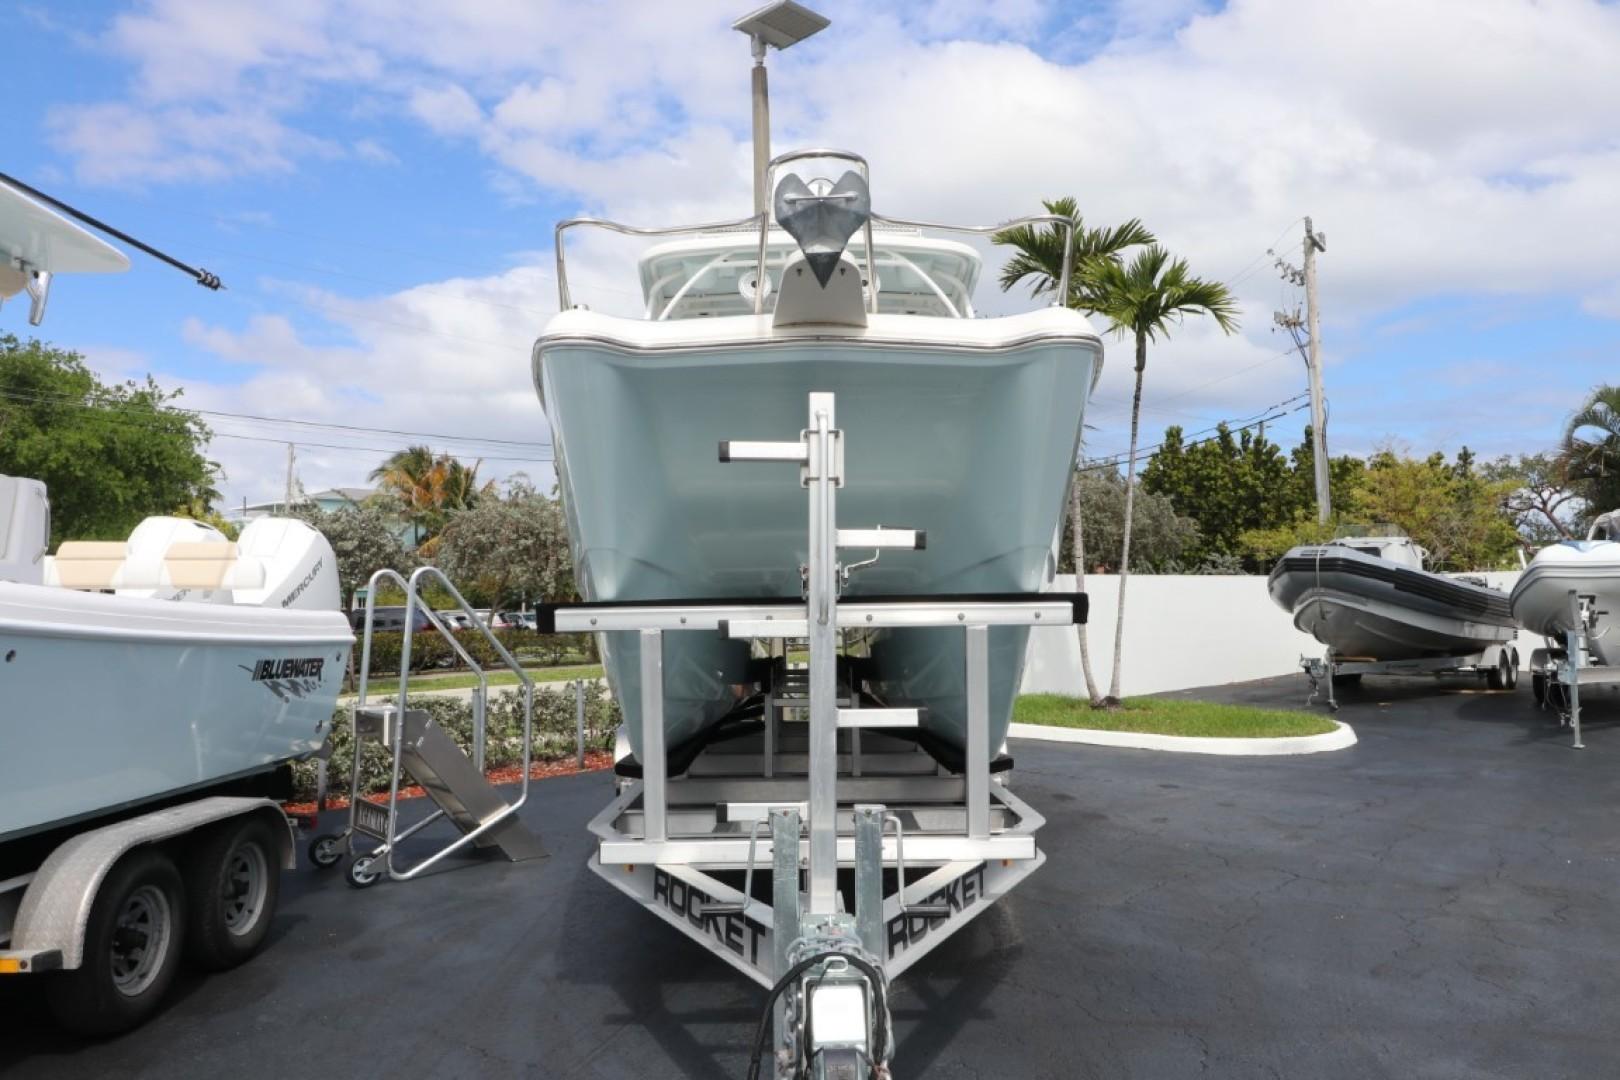 World Cat-255 DC 2019 -Palm Beach-Florida-United States-1631186 | Thumbnail